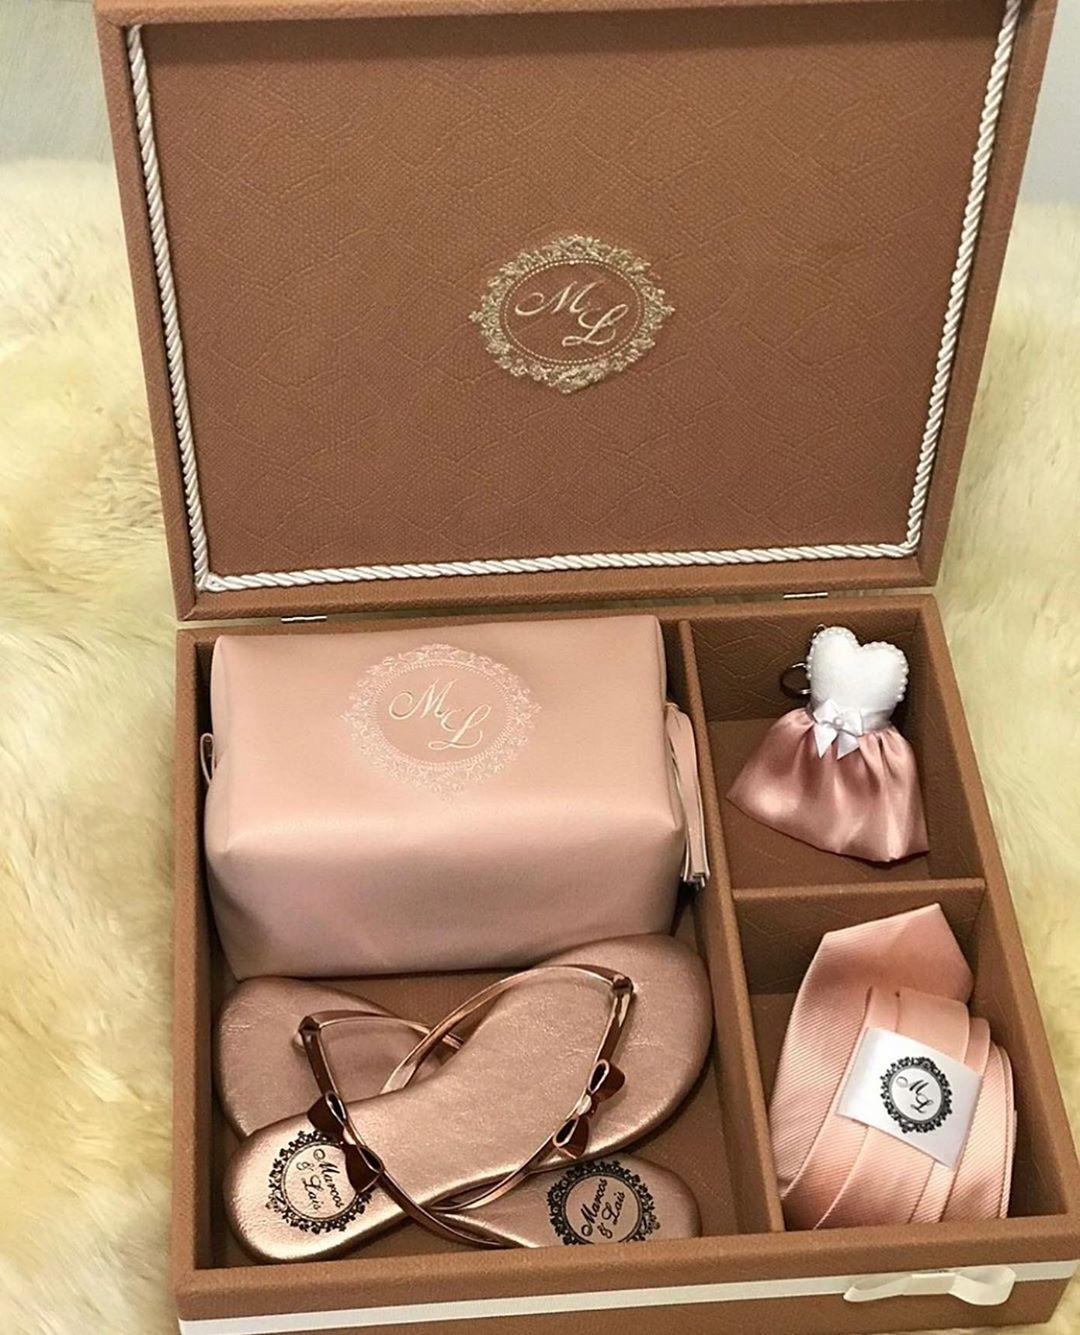 Eba Kaydol Eba Giris Eba Ders Eba Kurs Wedding Gifts For Bridesmaids Gifts For Wedding Party Wedding Gifts Packaging